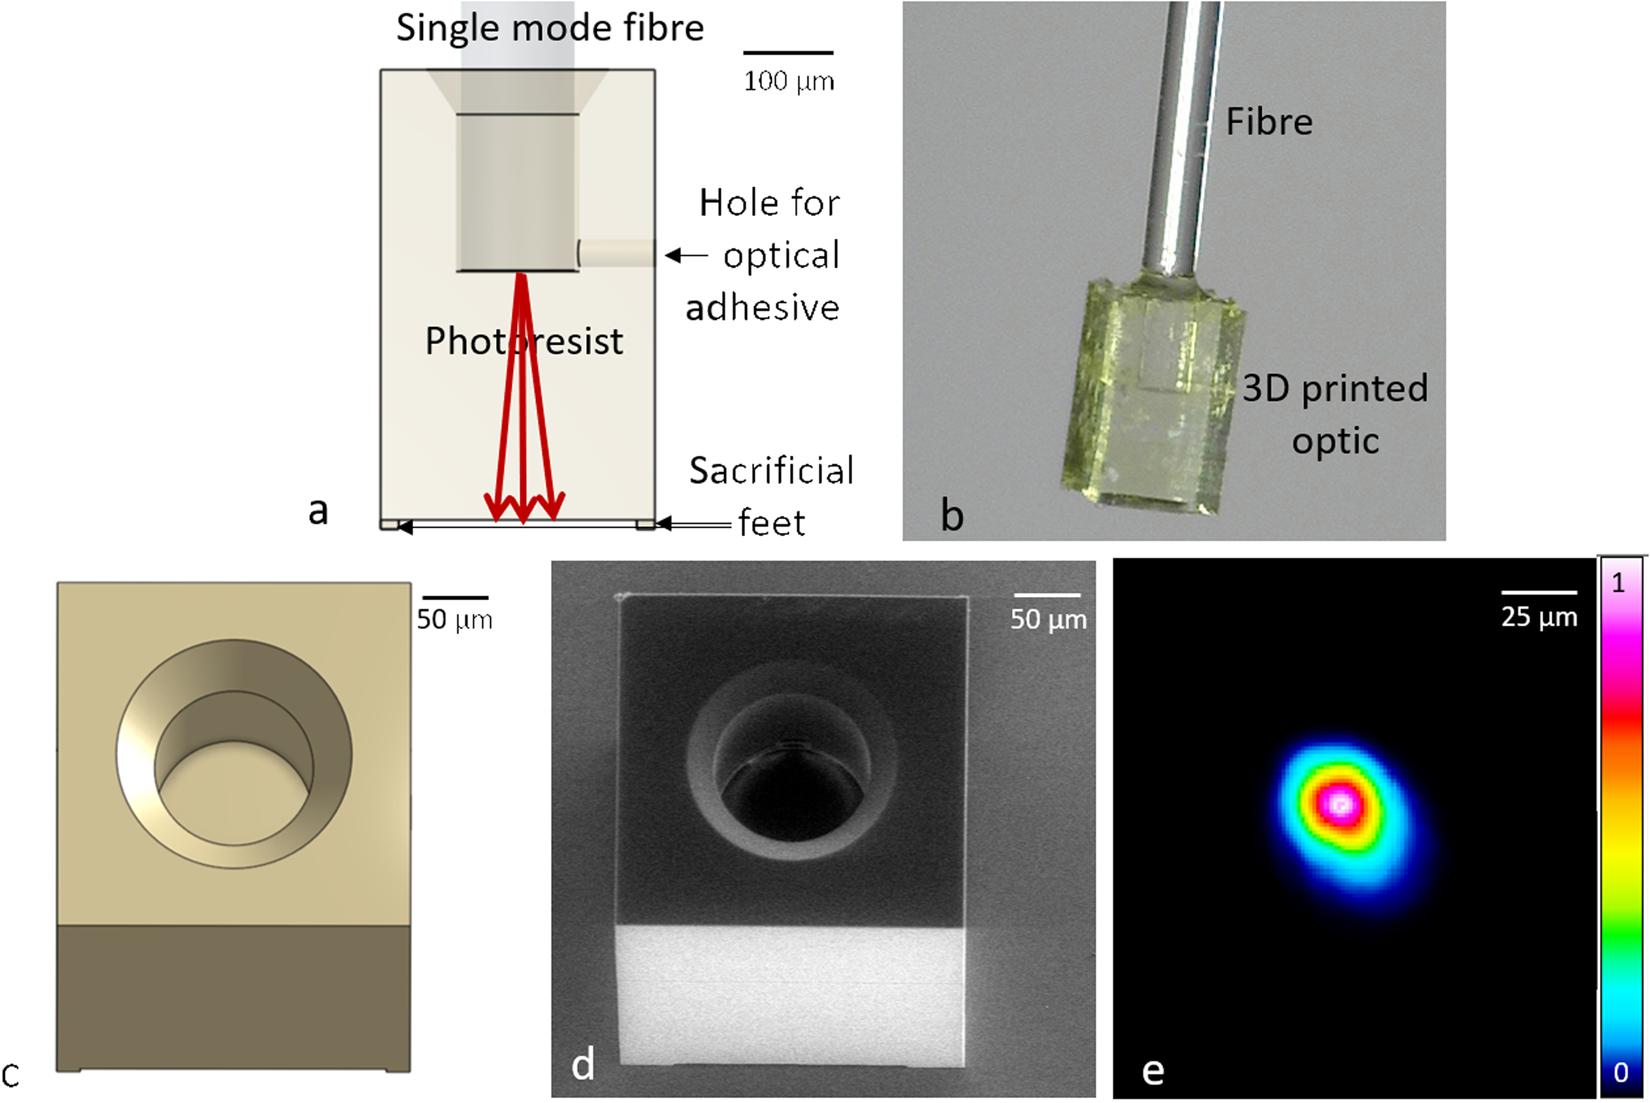 Two-photon polymerisation 3D printed freeform micro-optics